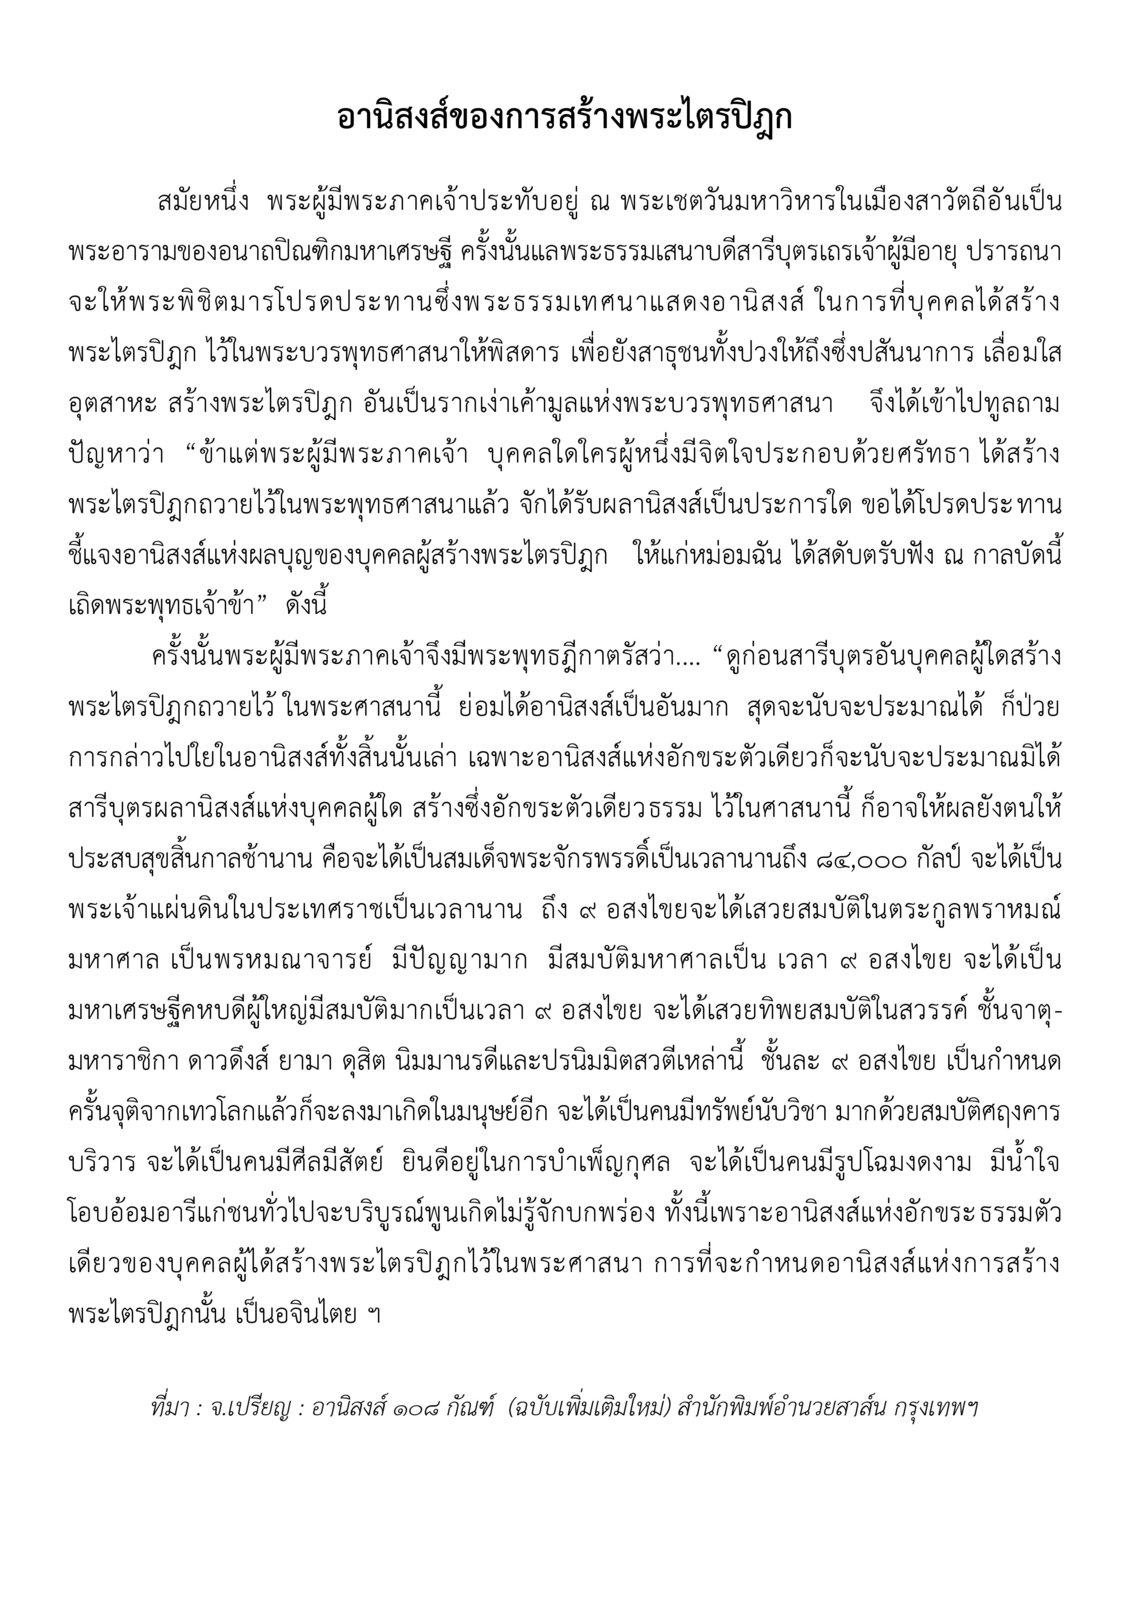 tripitaka14-02.pdf.jpg